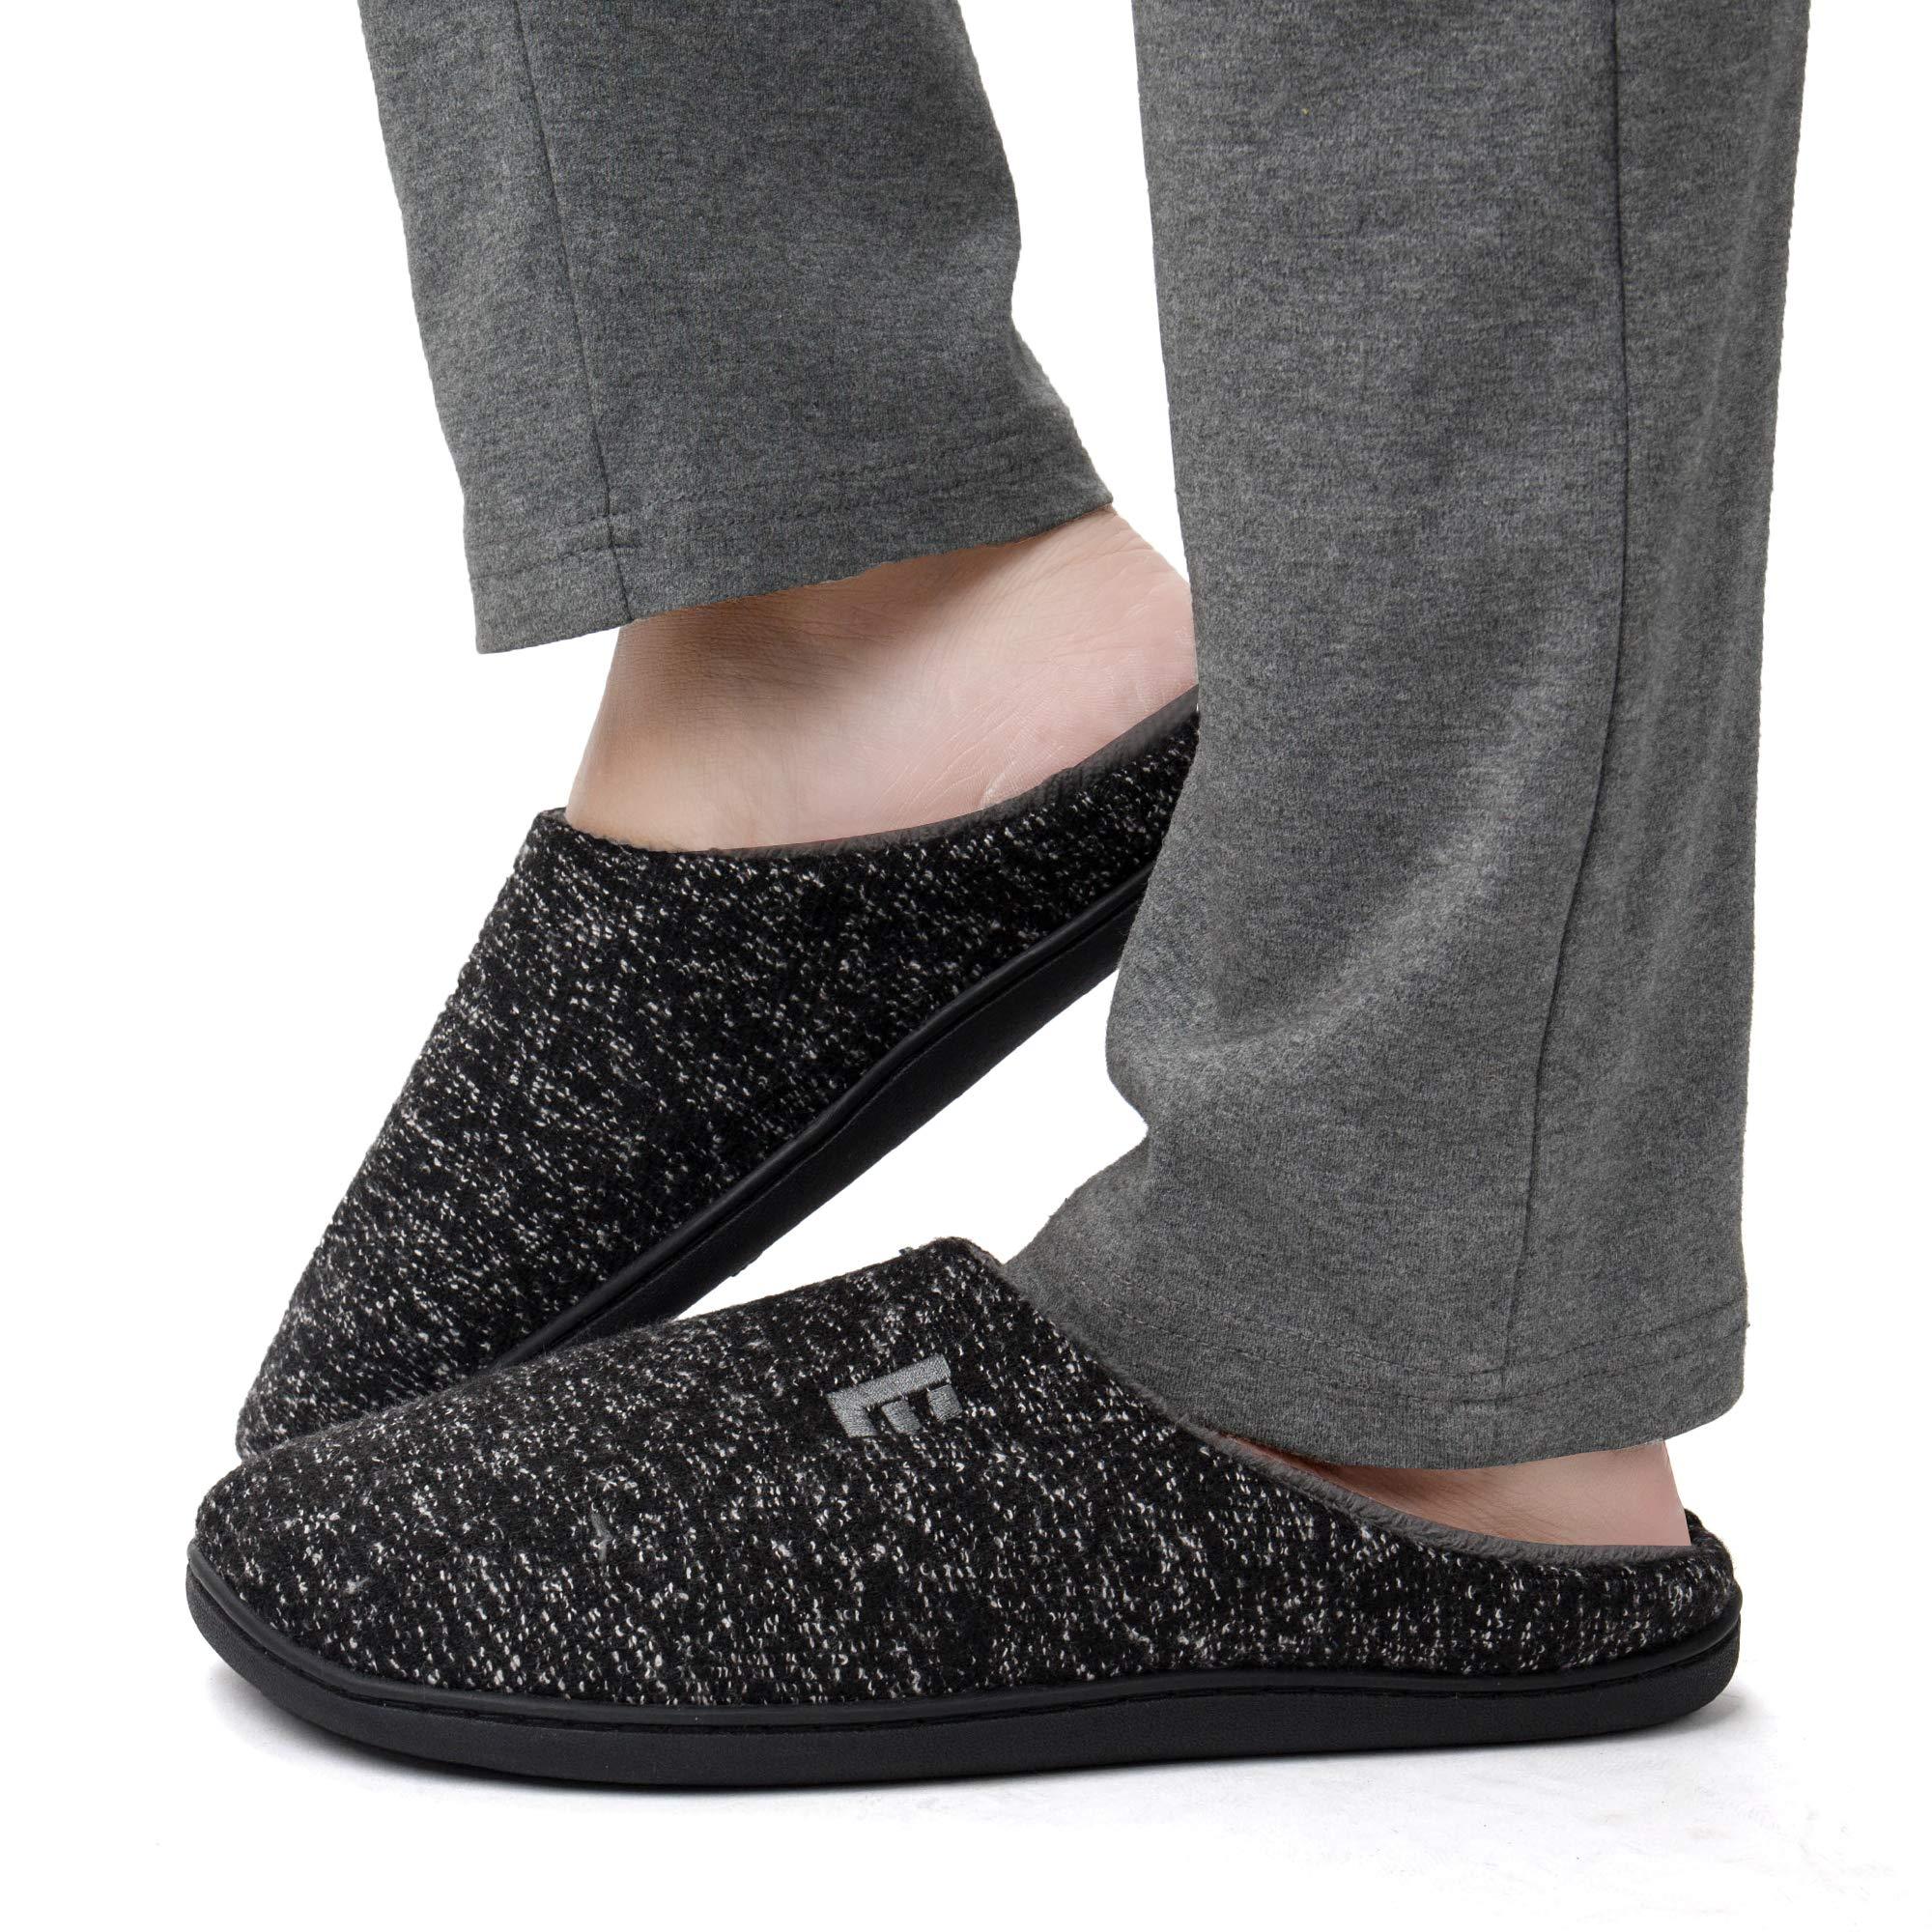 EAST LANDER Men's Memory Foam House Slippers Soft Sole Anti-Slip Slippers Indoor Shoes ELMT003-M1-L